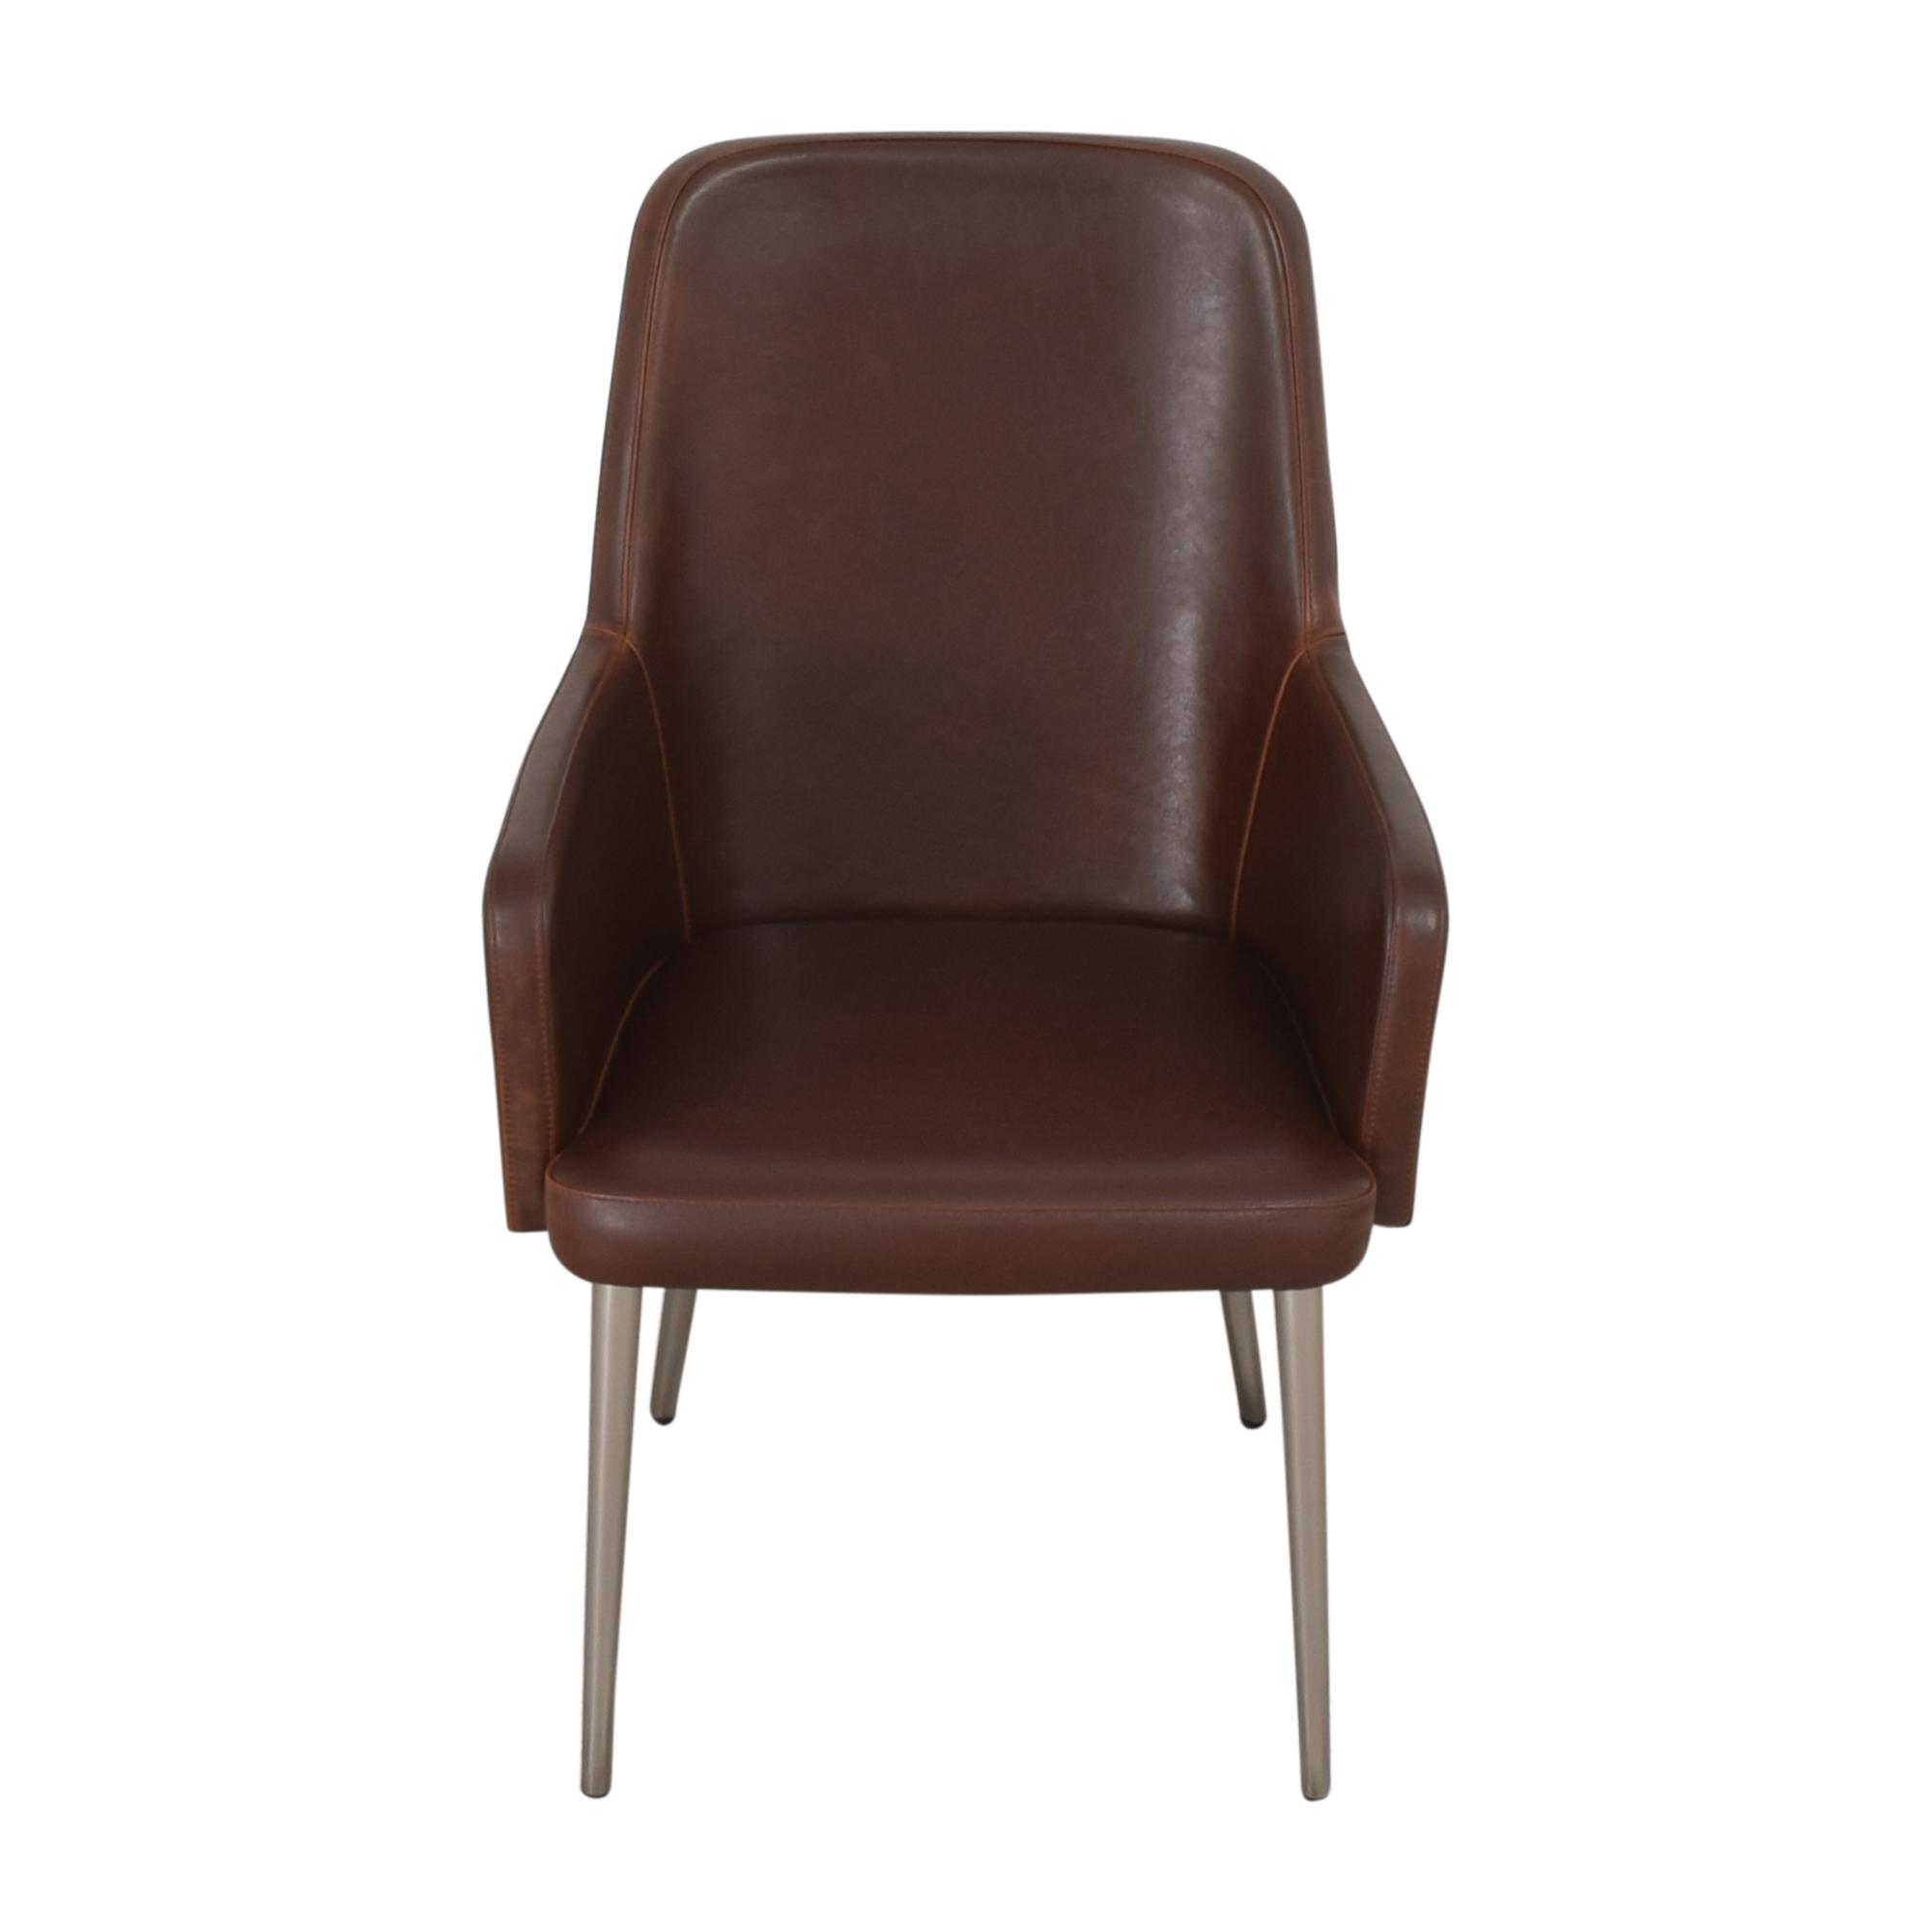 CB2 CB2 Aragon Chair nj